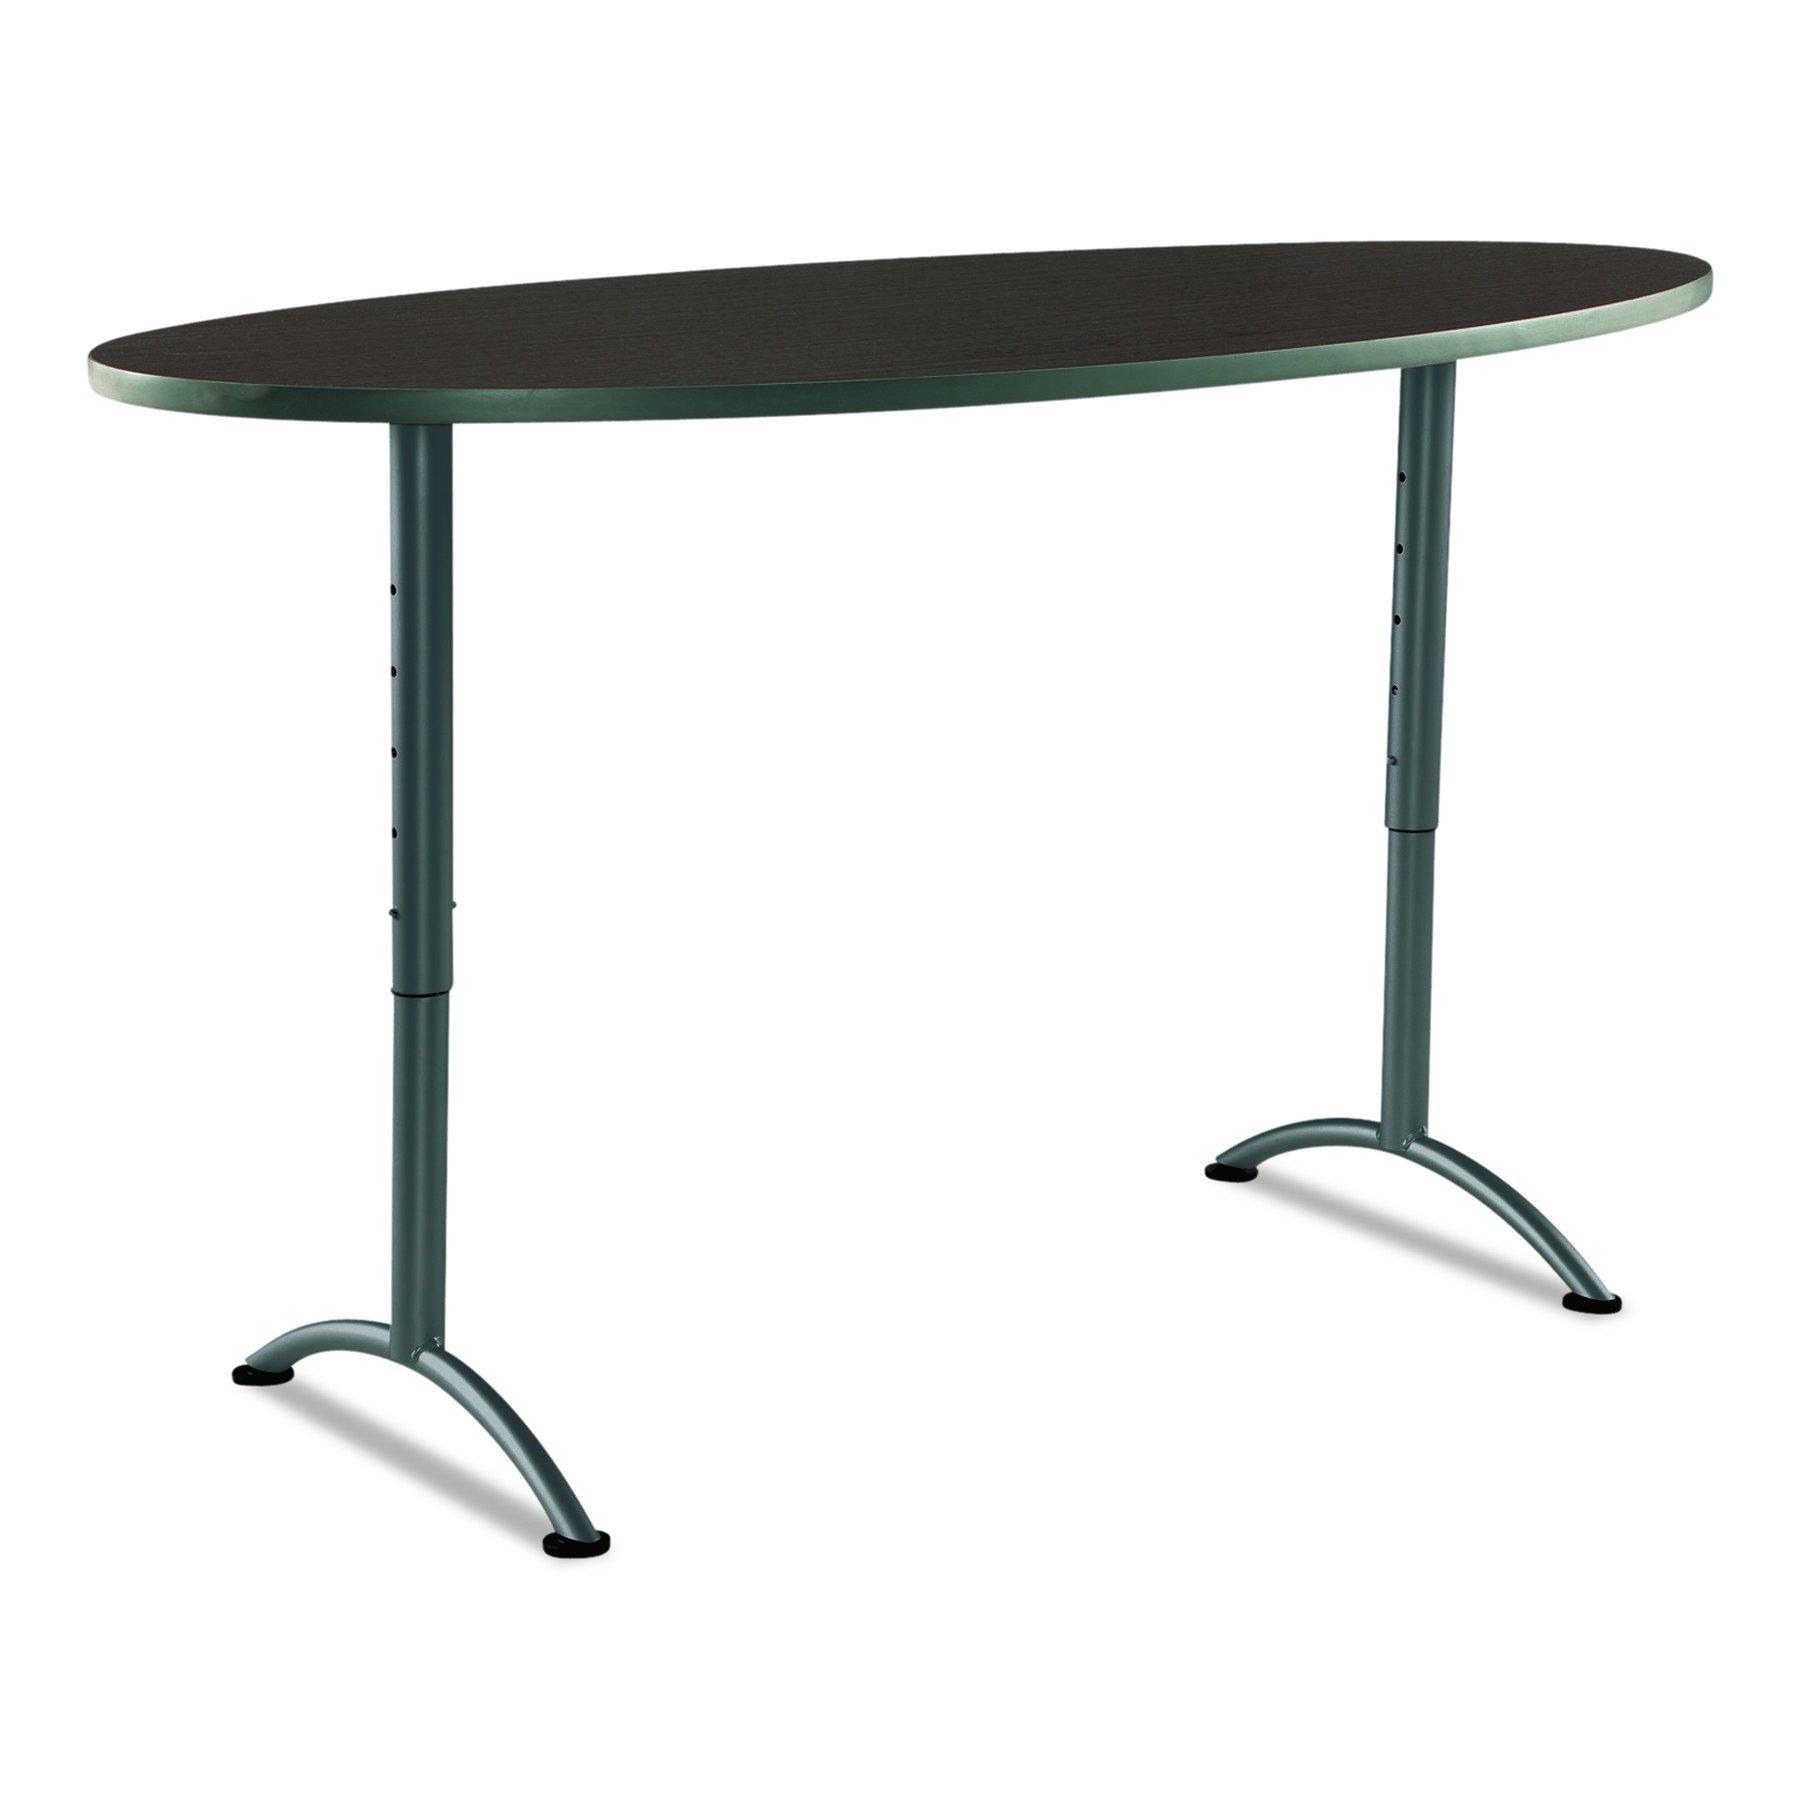 Iceberg ICE69624 ARC 6-foot Adjustable Height Oval Conference Table, 36'' x 72'', Walnut/Gray Leg by Iceberg